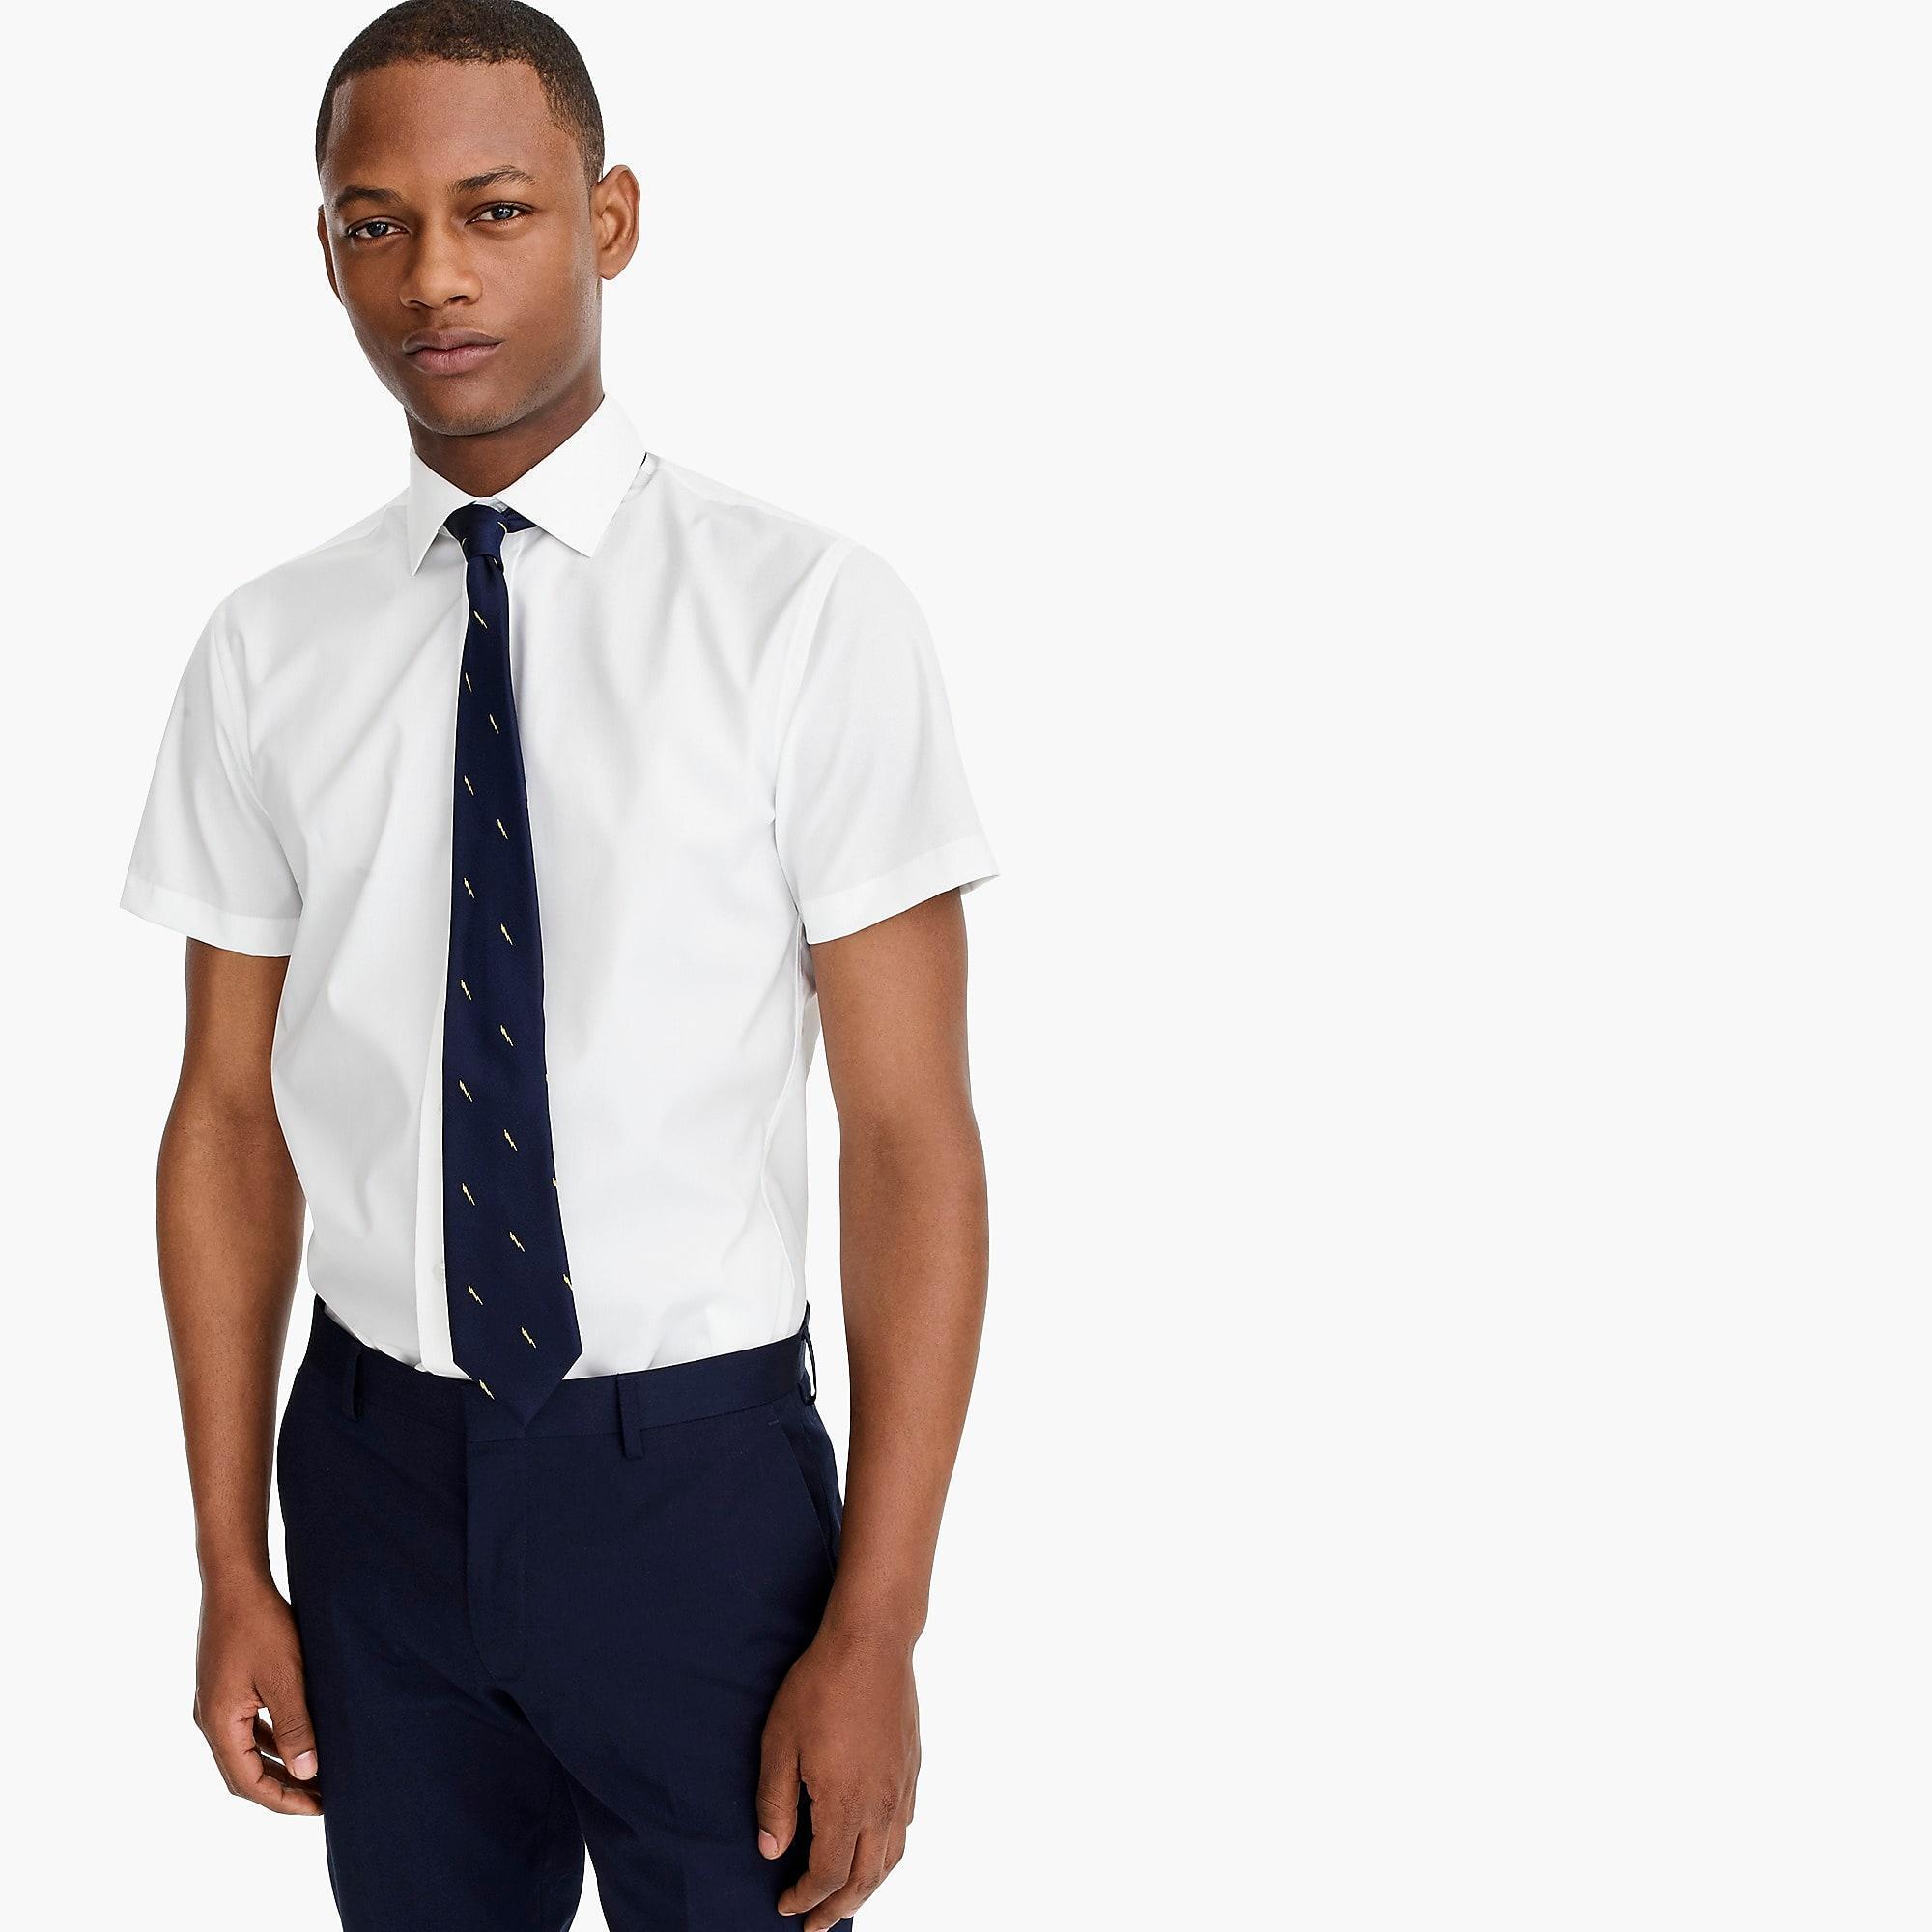 296222c2bd2d J.Crew. Men's Short-sleeve Ludlow Stretch Two-ply Easy-care Cotton Dress  Shirt ...